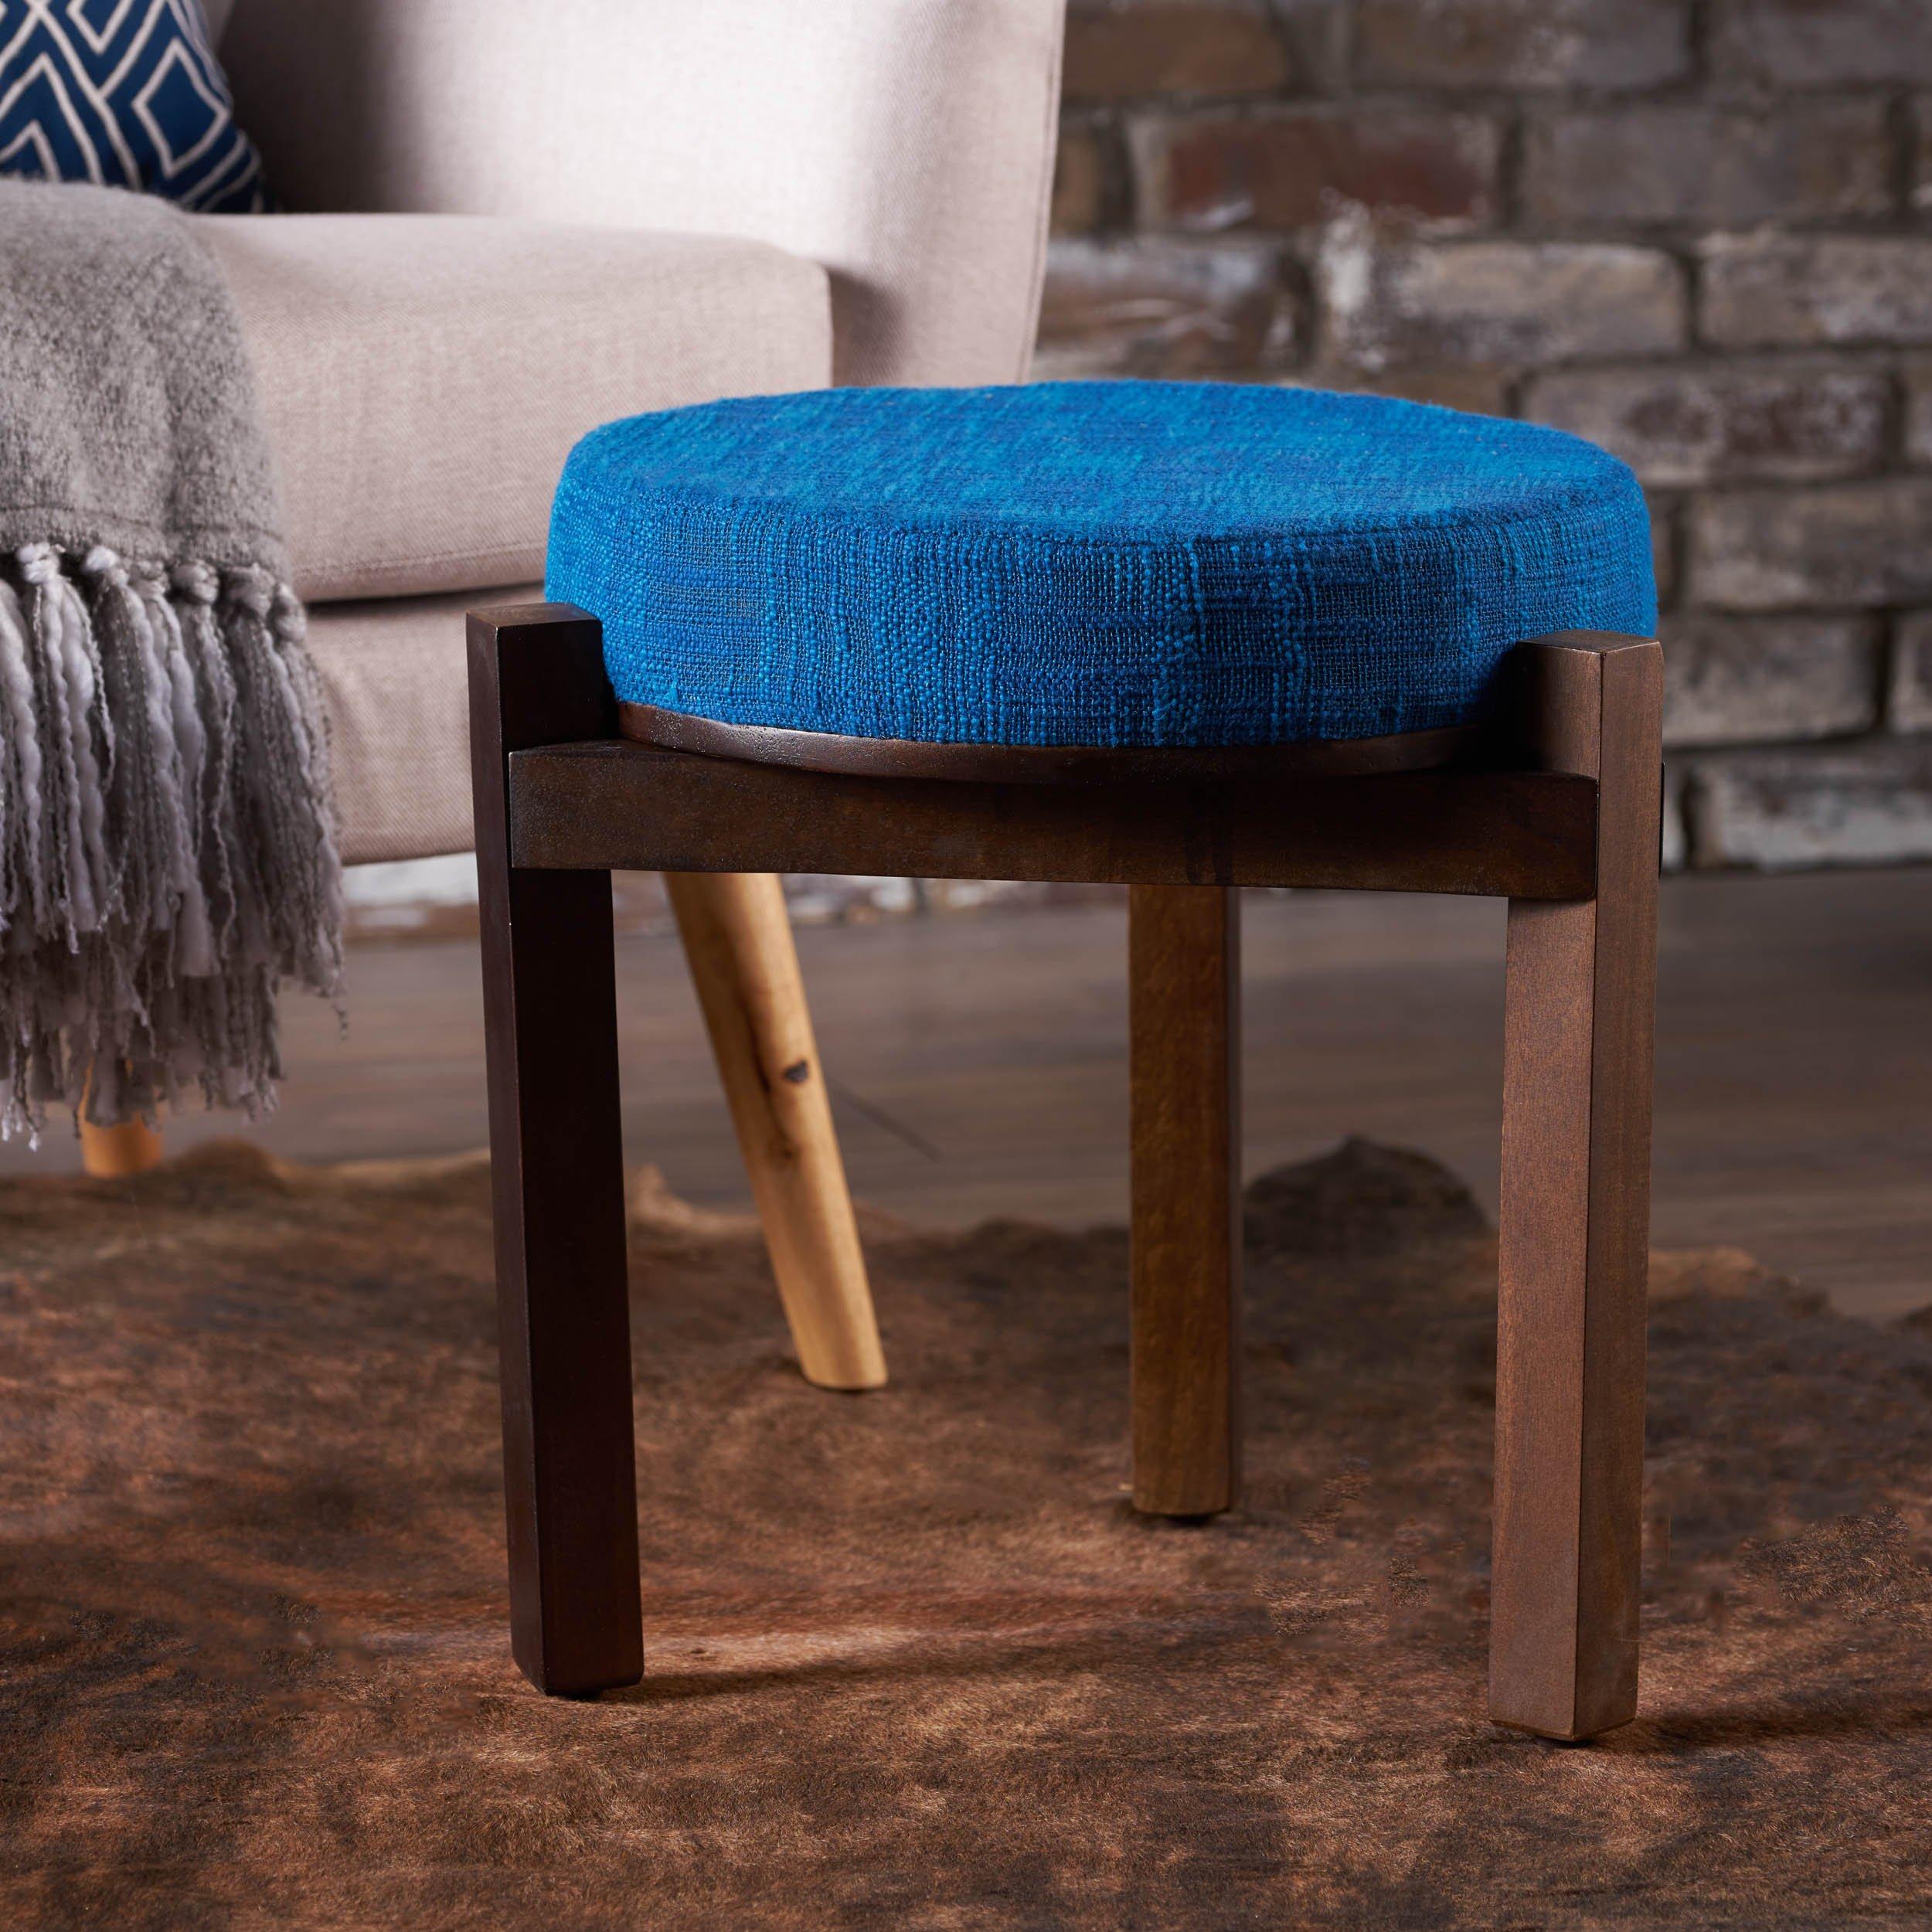 Christopher Knight Home 300916 Living D'Artagnan Fabric Stool Mango Wood Frame (Blue) Walnut